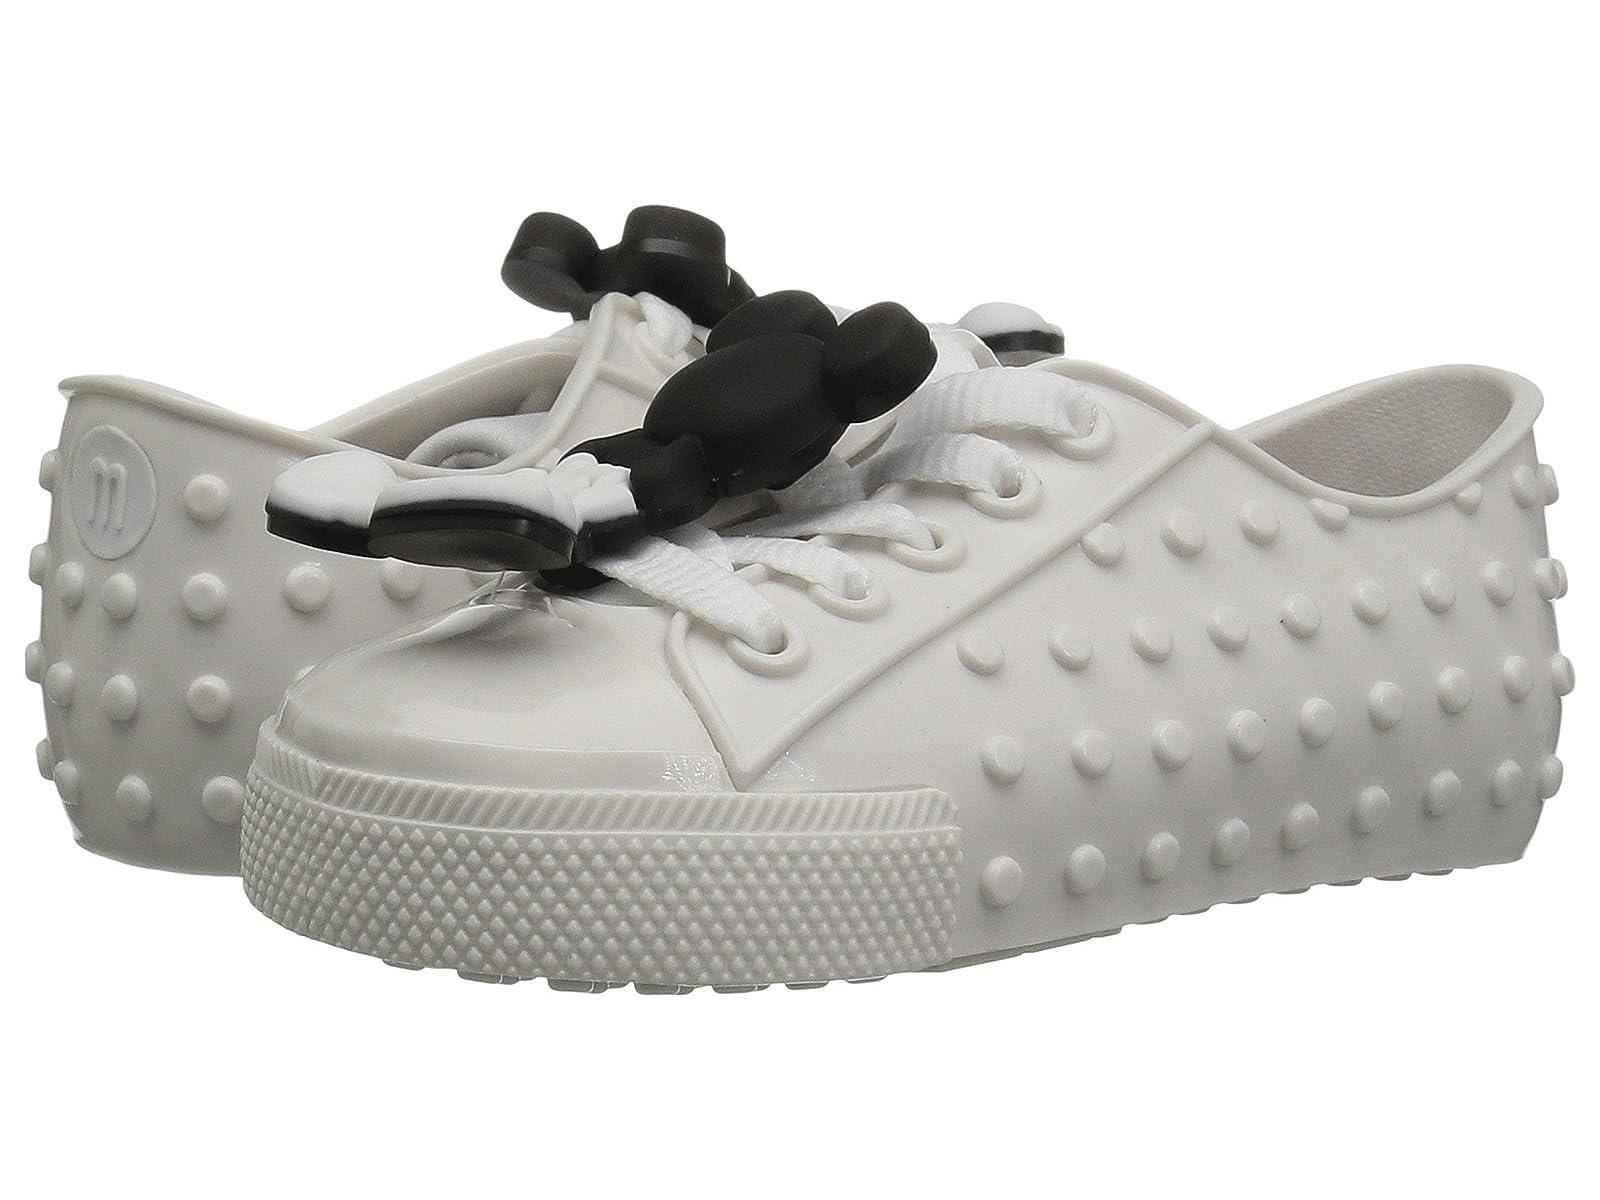 Mini Melissa Mini Polibolha + Disney (Toddler)Atmospheric grades have affordable shoes